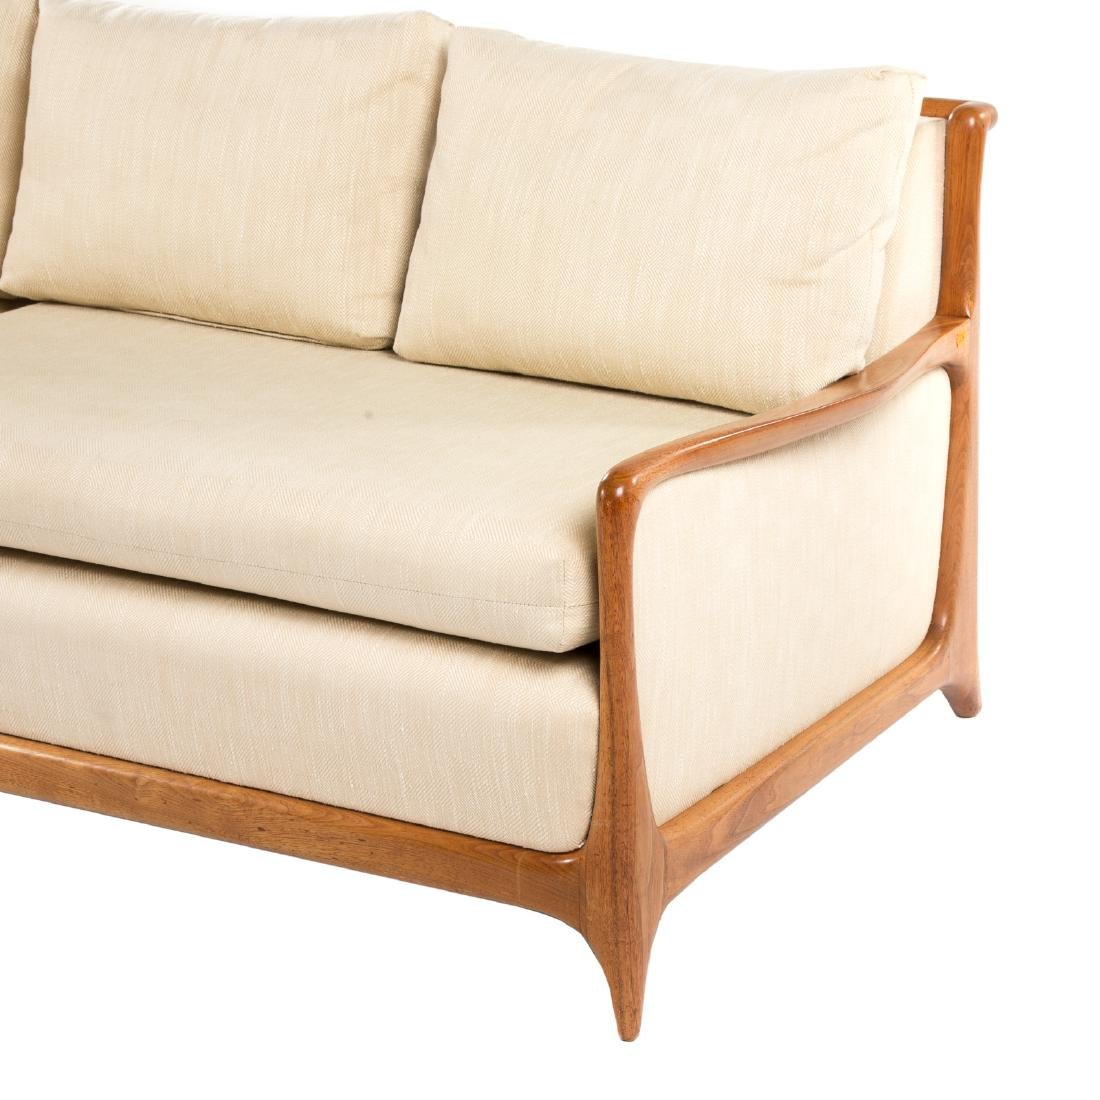 Vladimir Kagan - Dreyfuss walnut upholstered sofa - 3